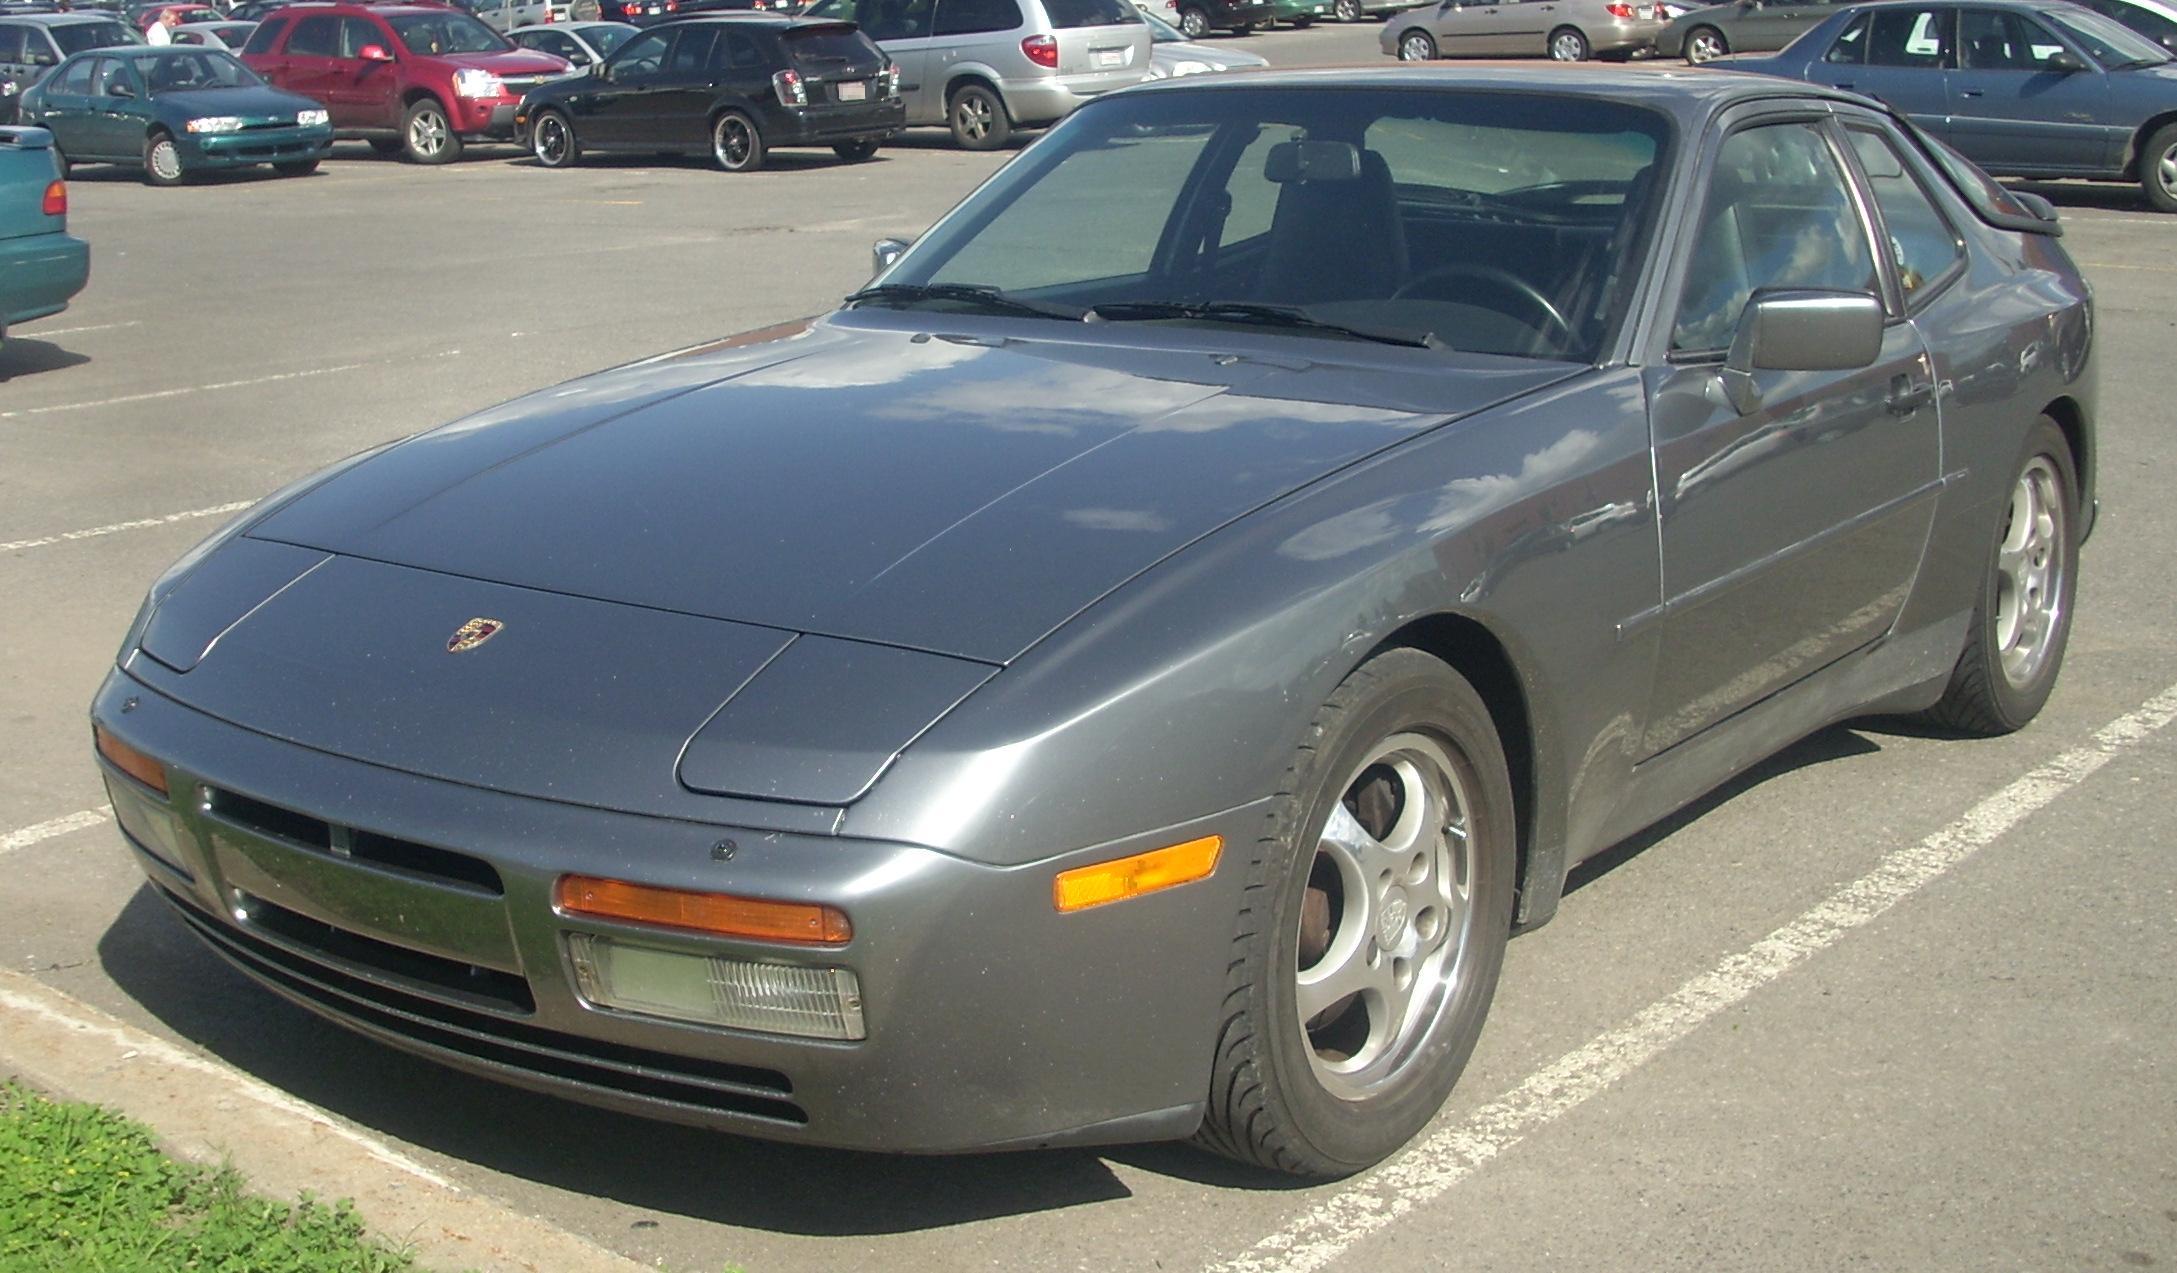 File:'86-'91 Porsche 944 Coupe Turbo.JPG - Wikimedia Commons